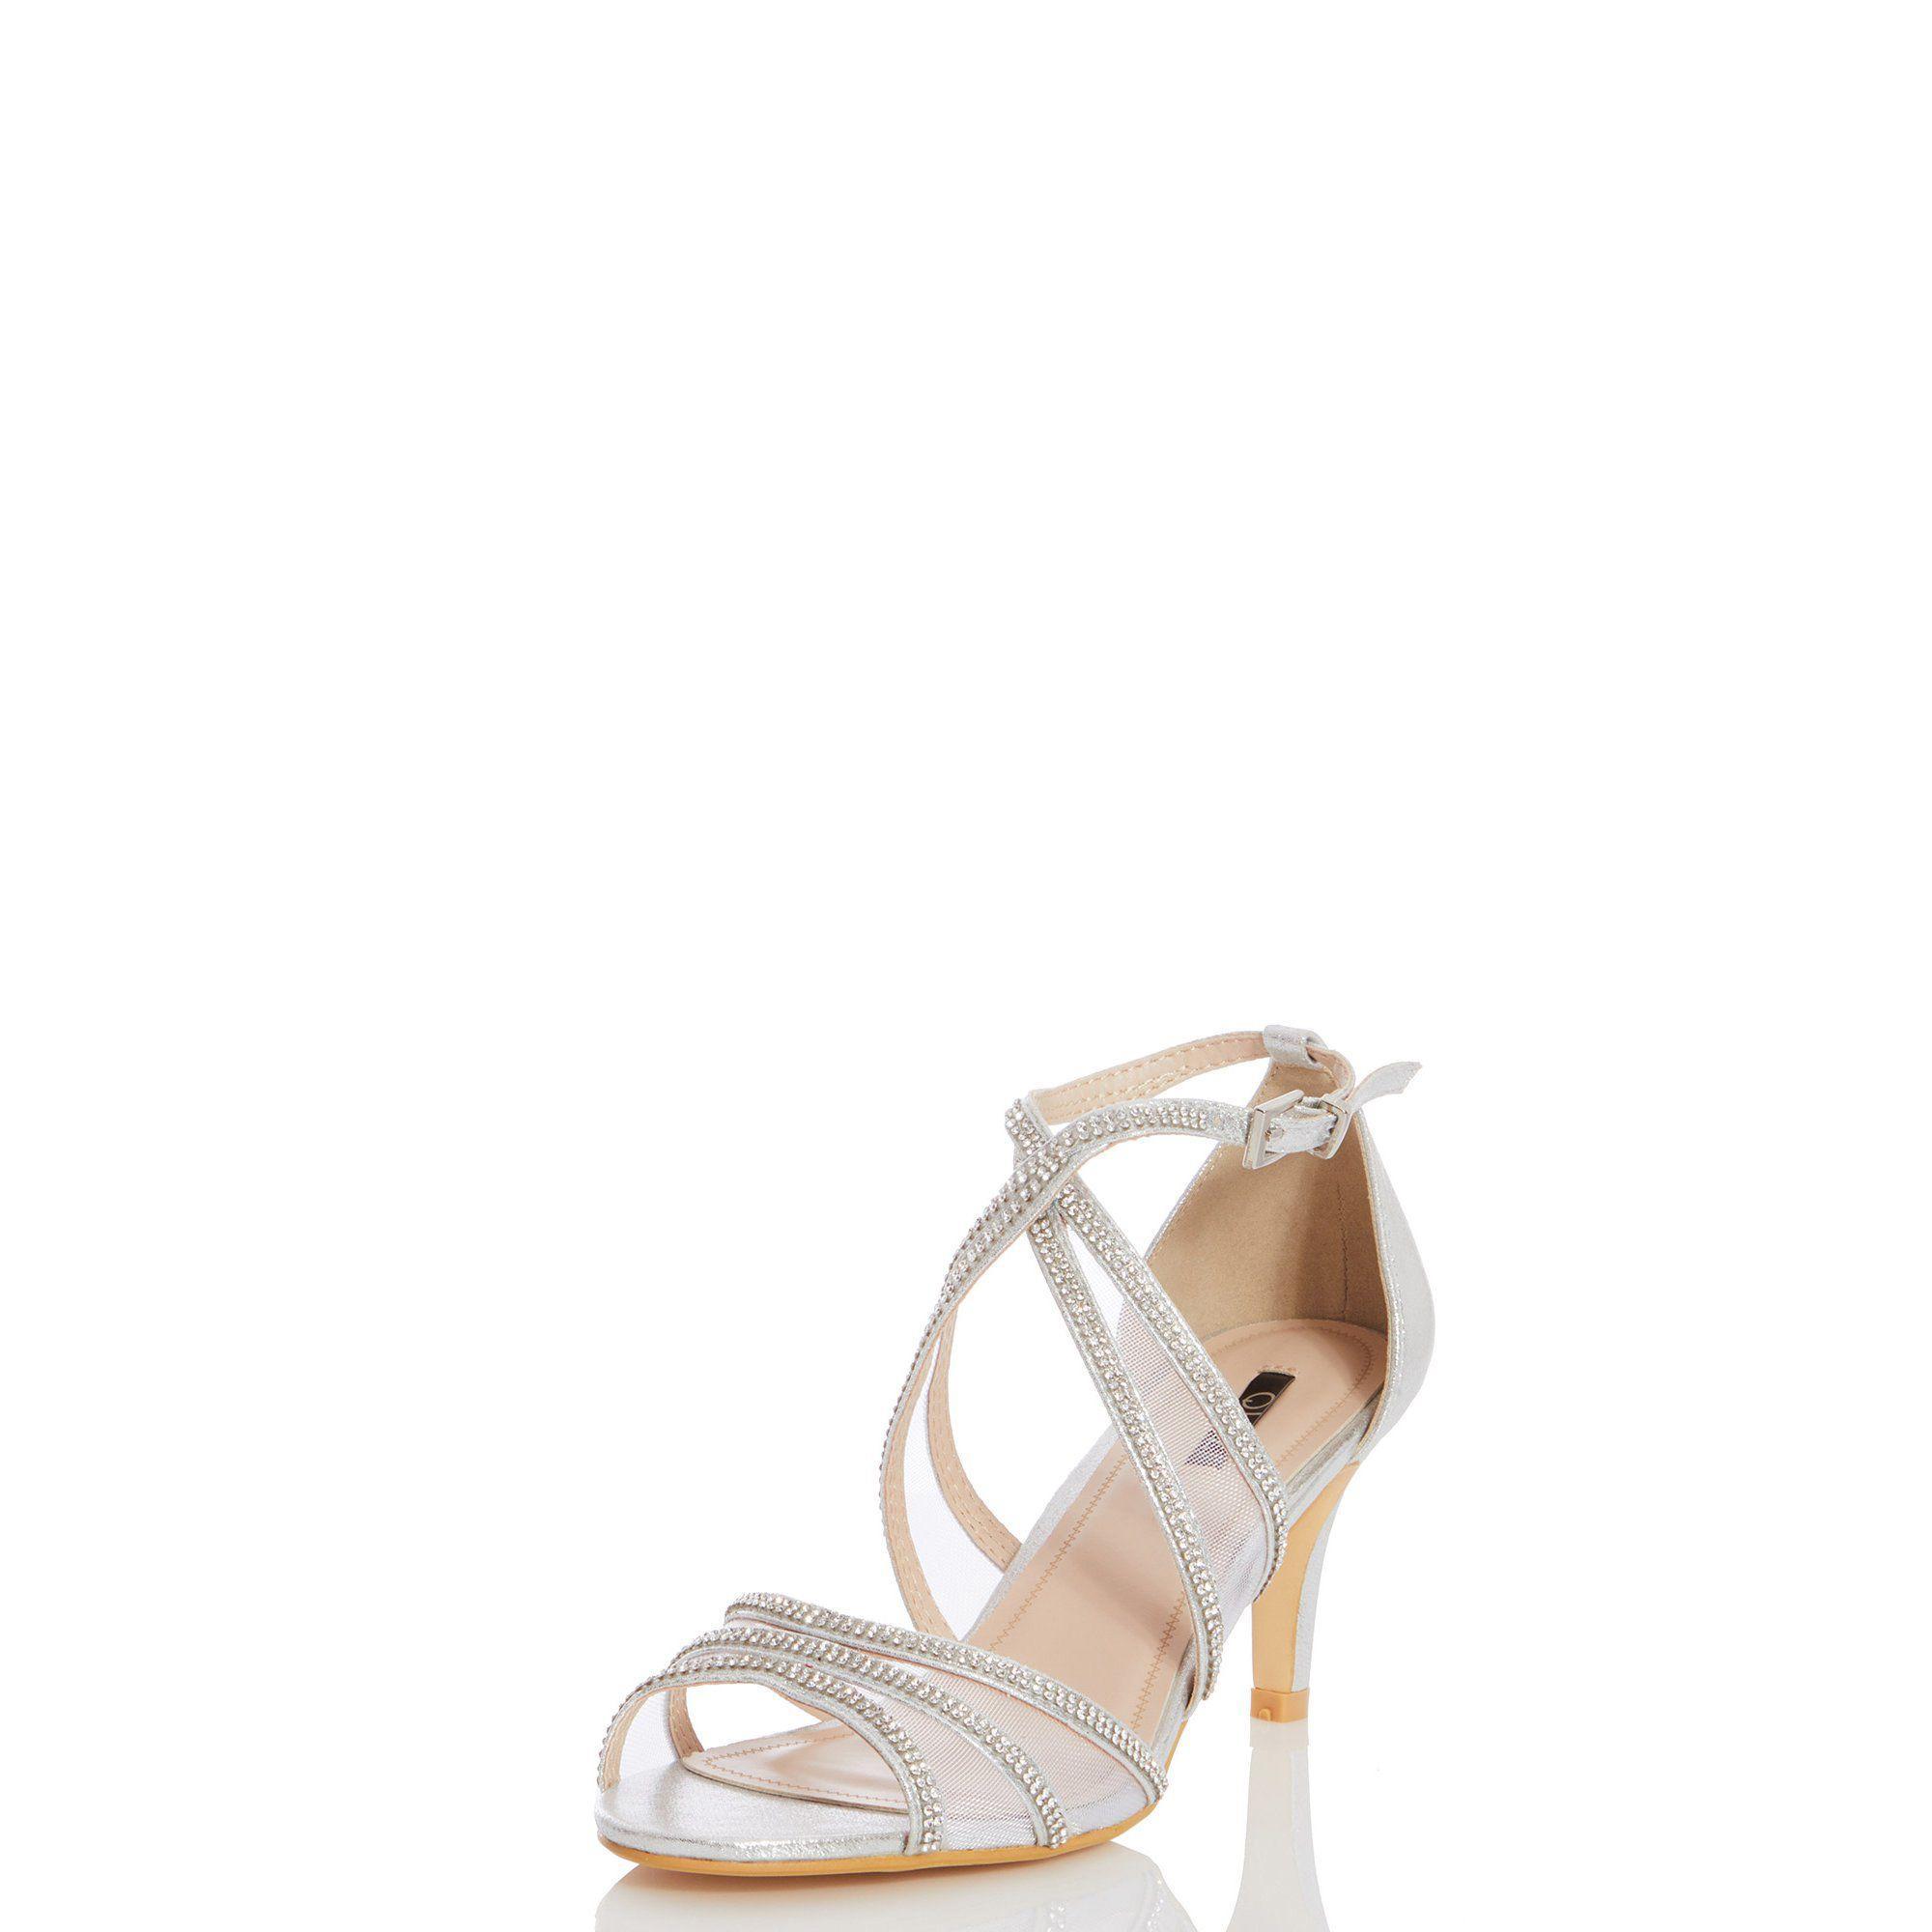 ffbf09989379 Quiz - Metallic Silver Shimmer Diamante Low Heel Sandals - Lyst. View  fullscreen